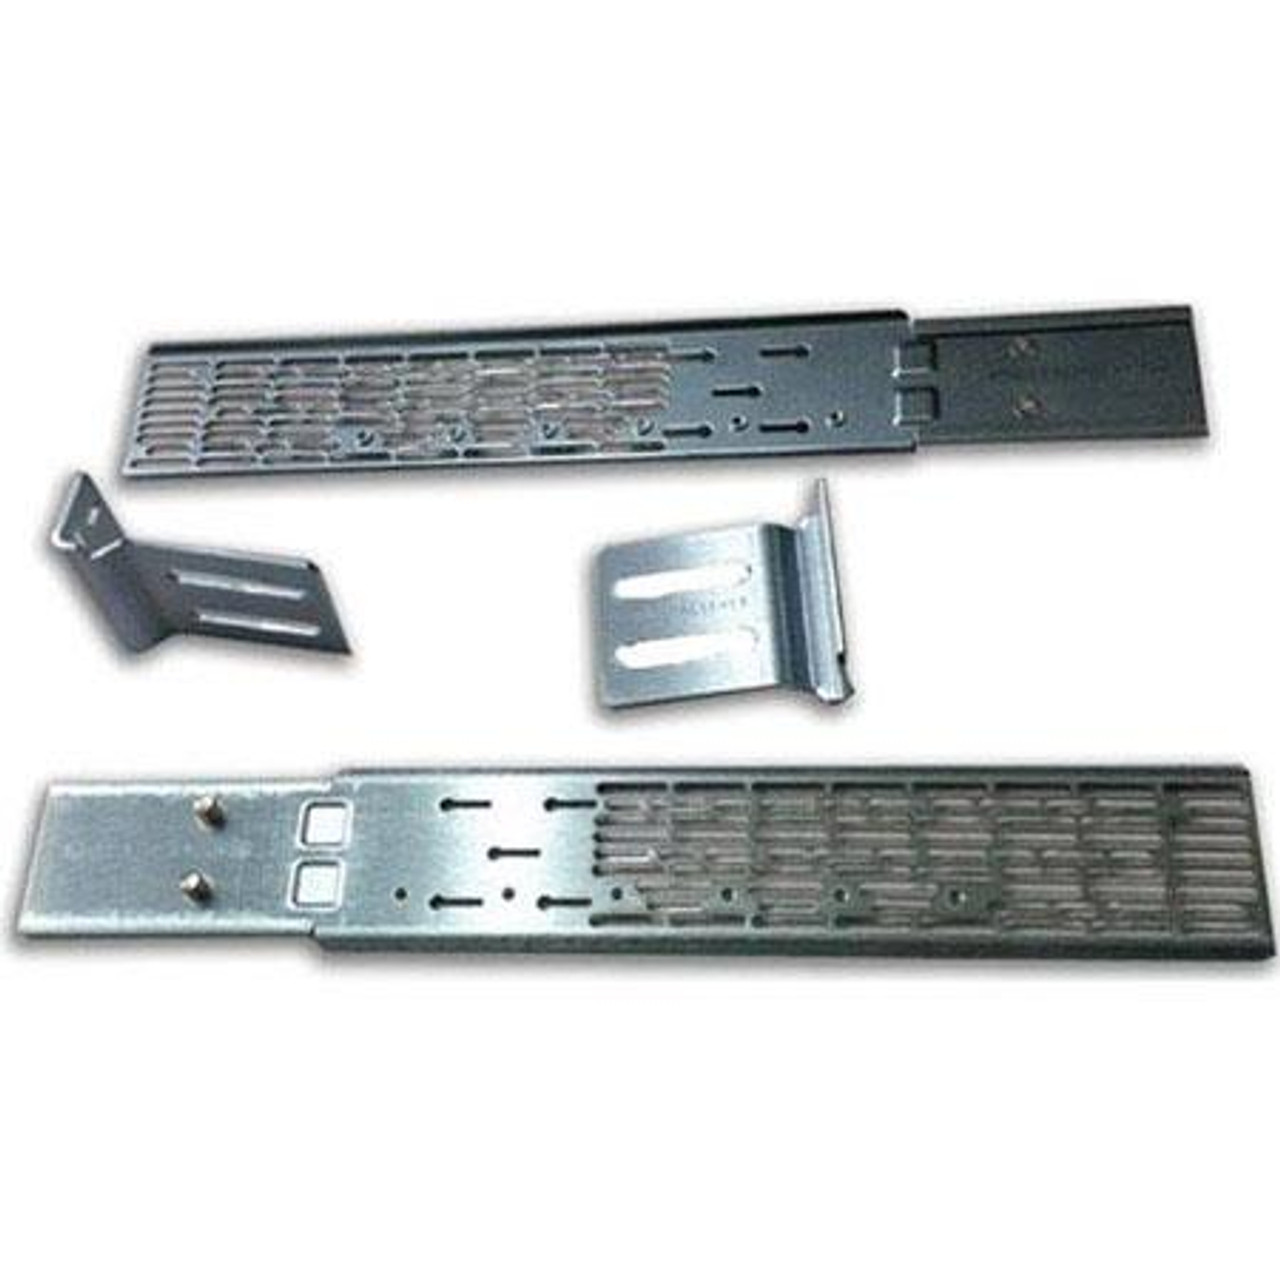 Blackmagic Design Fsb Og3 Opengear Rear Support Brackets For Installation Into 30 Deep Racks